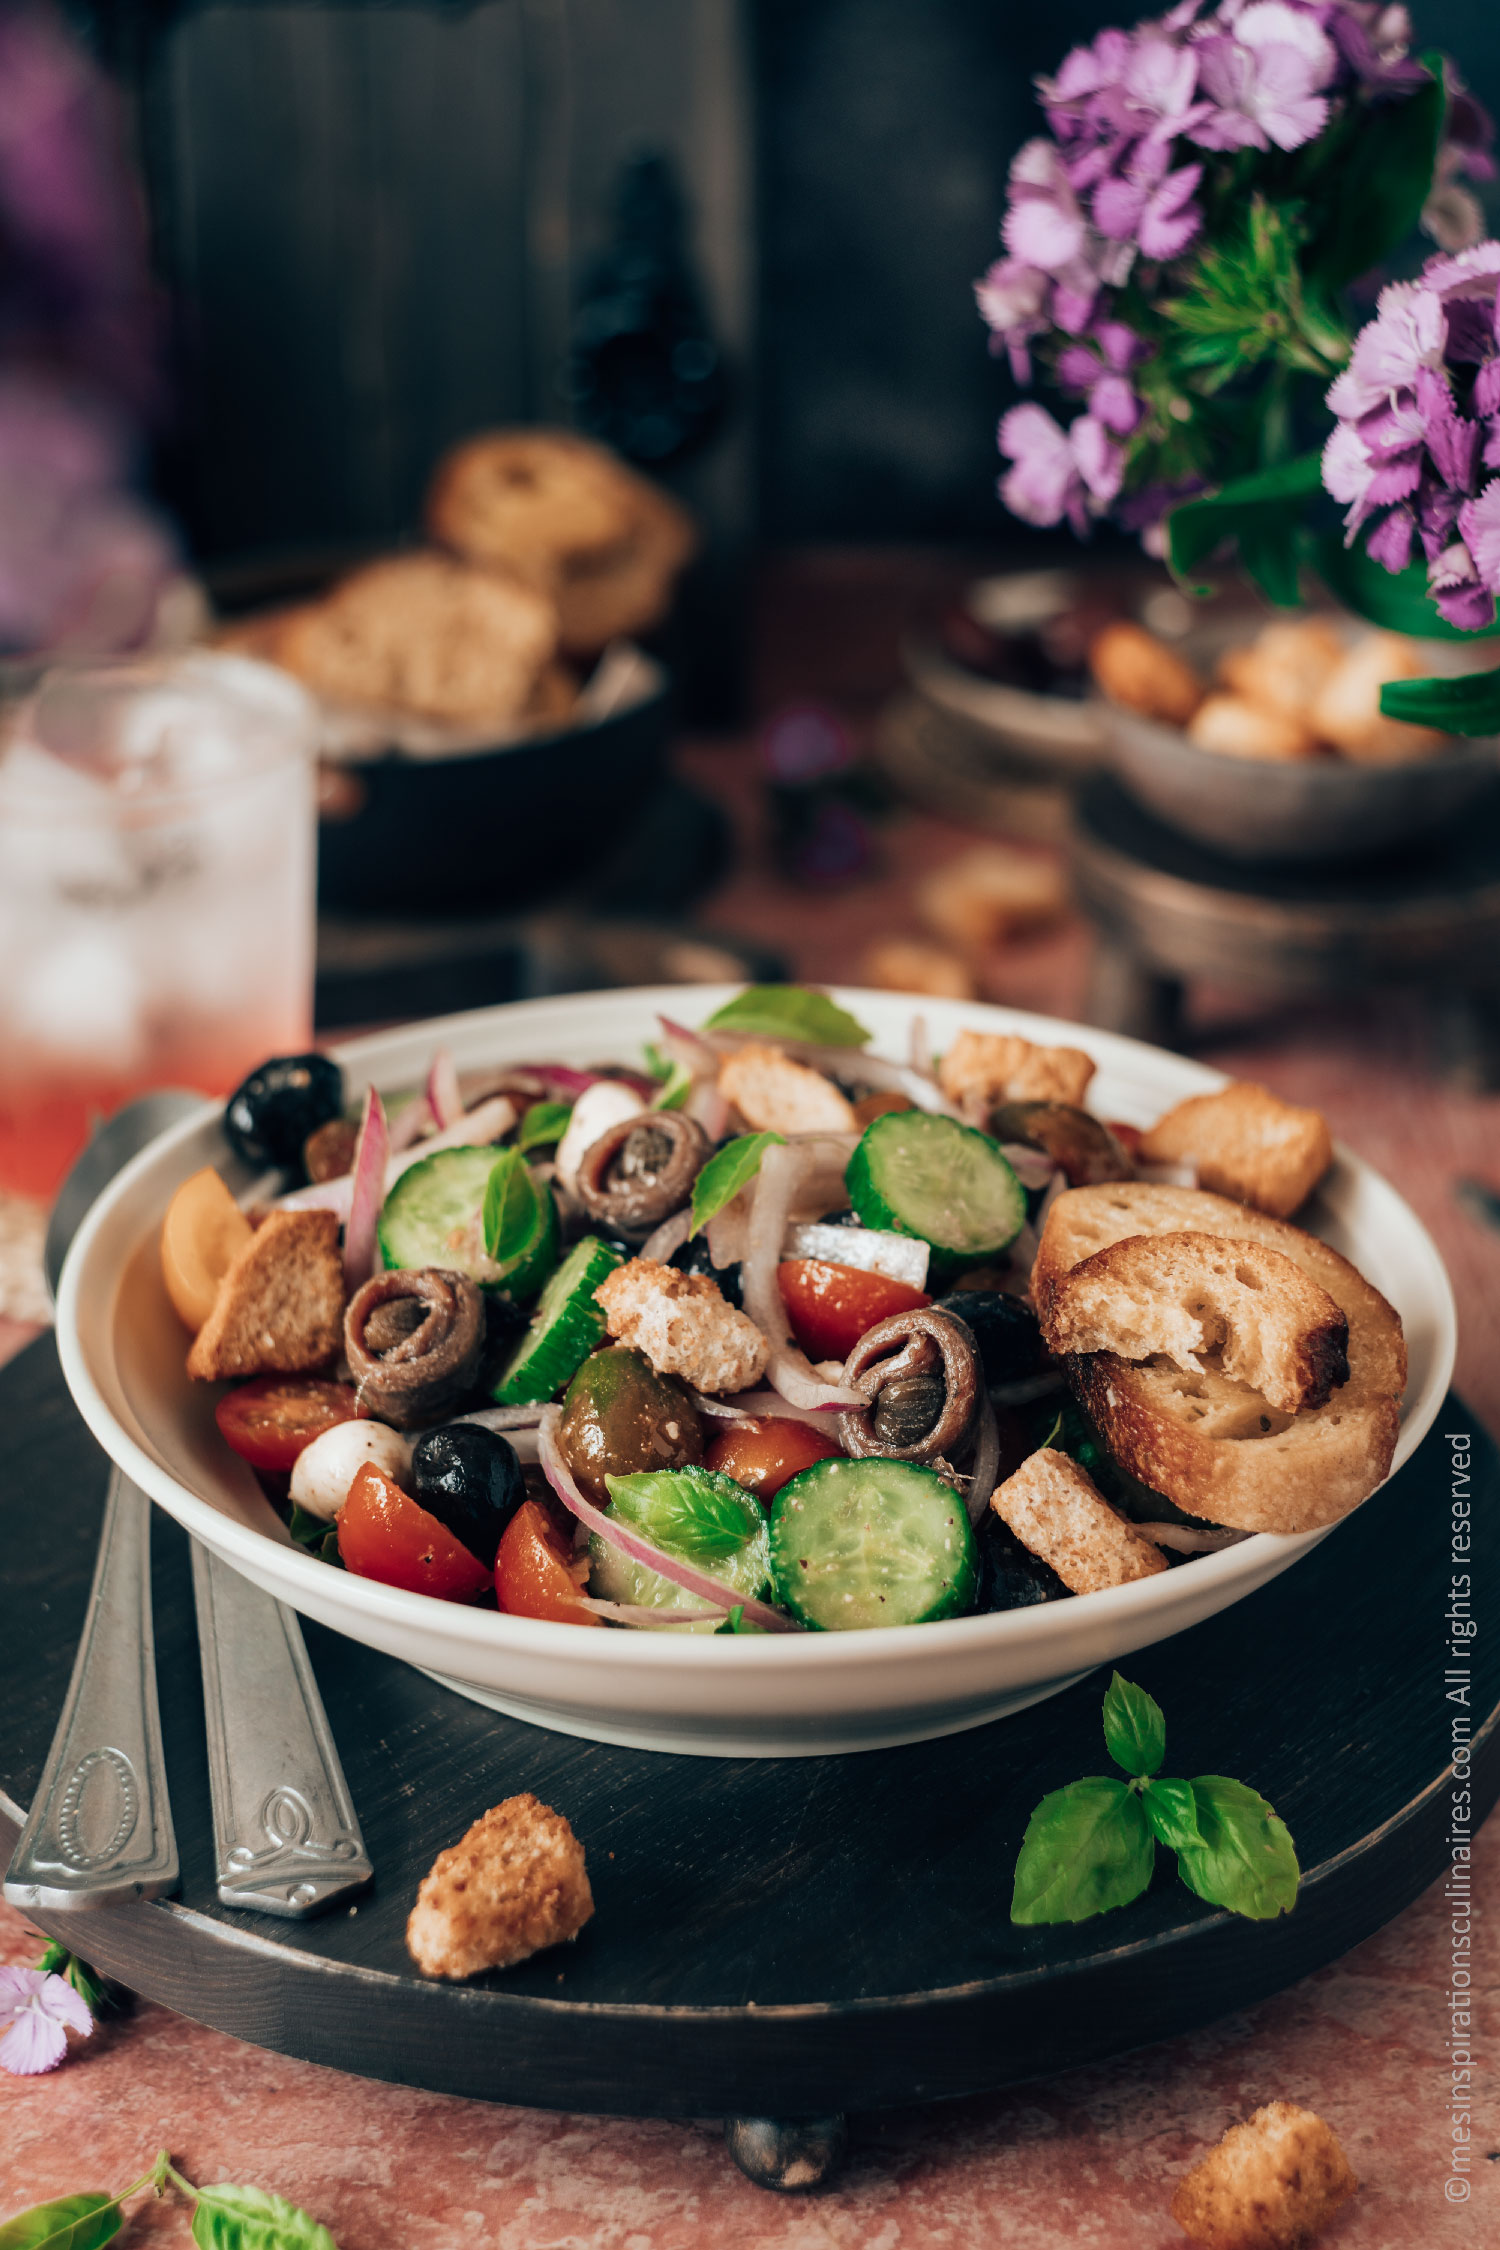 Panzanella salade tomates, concombres oignons rouge et pain rassis